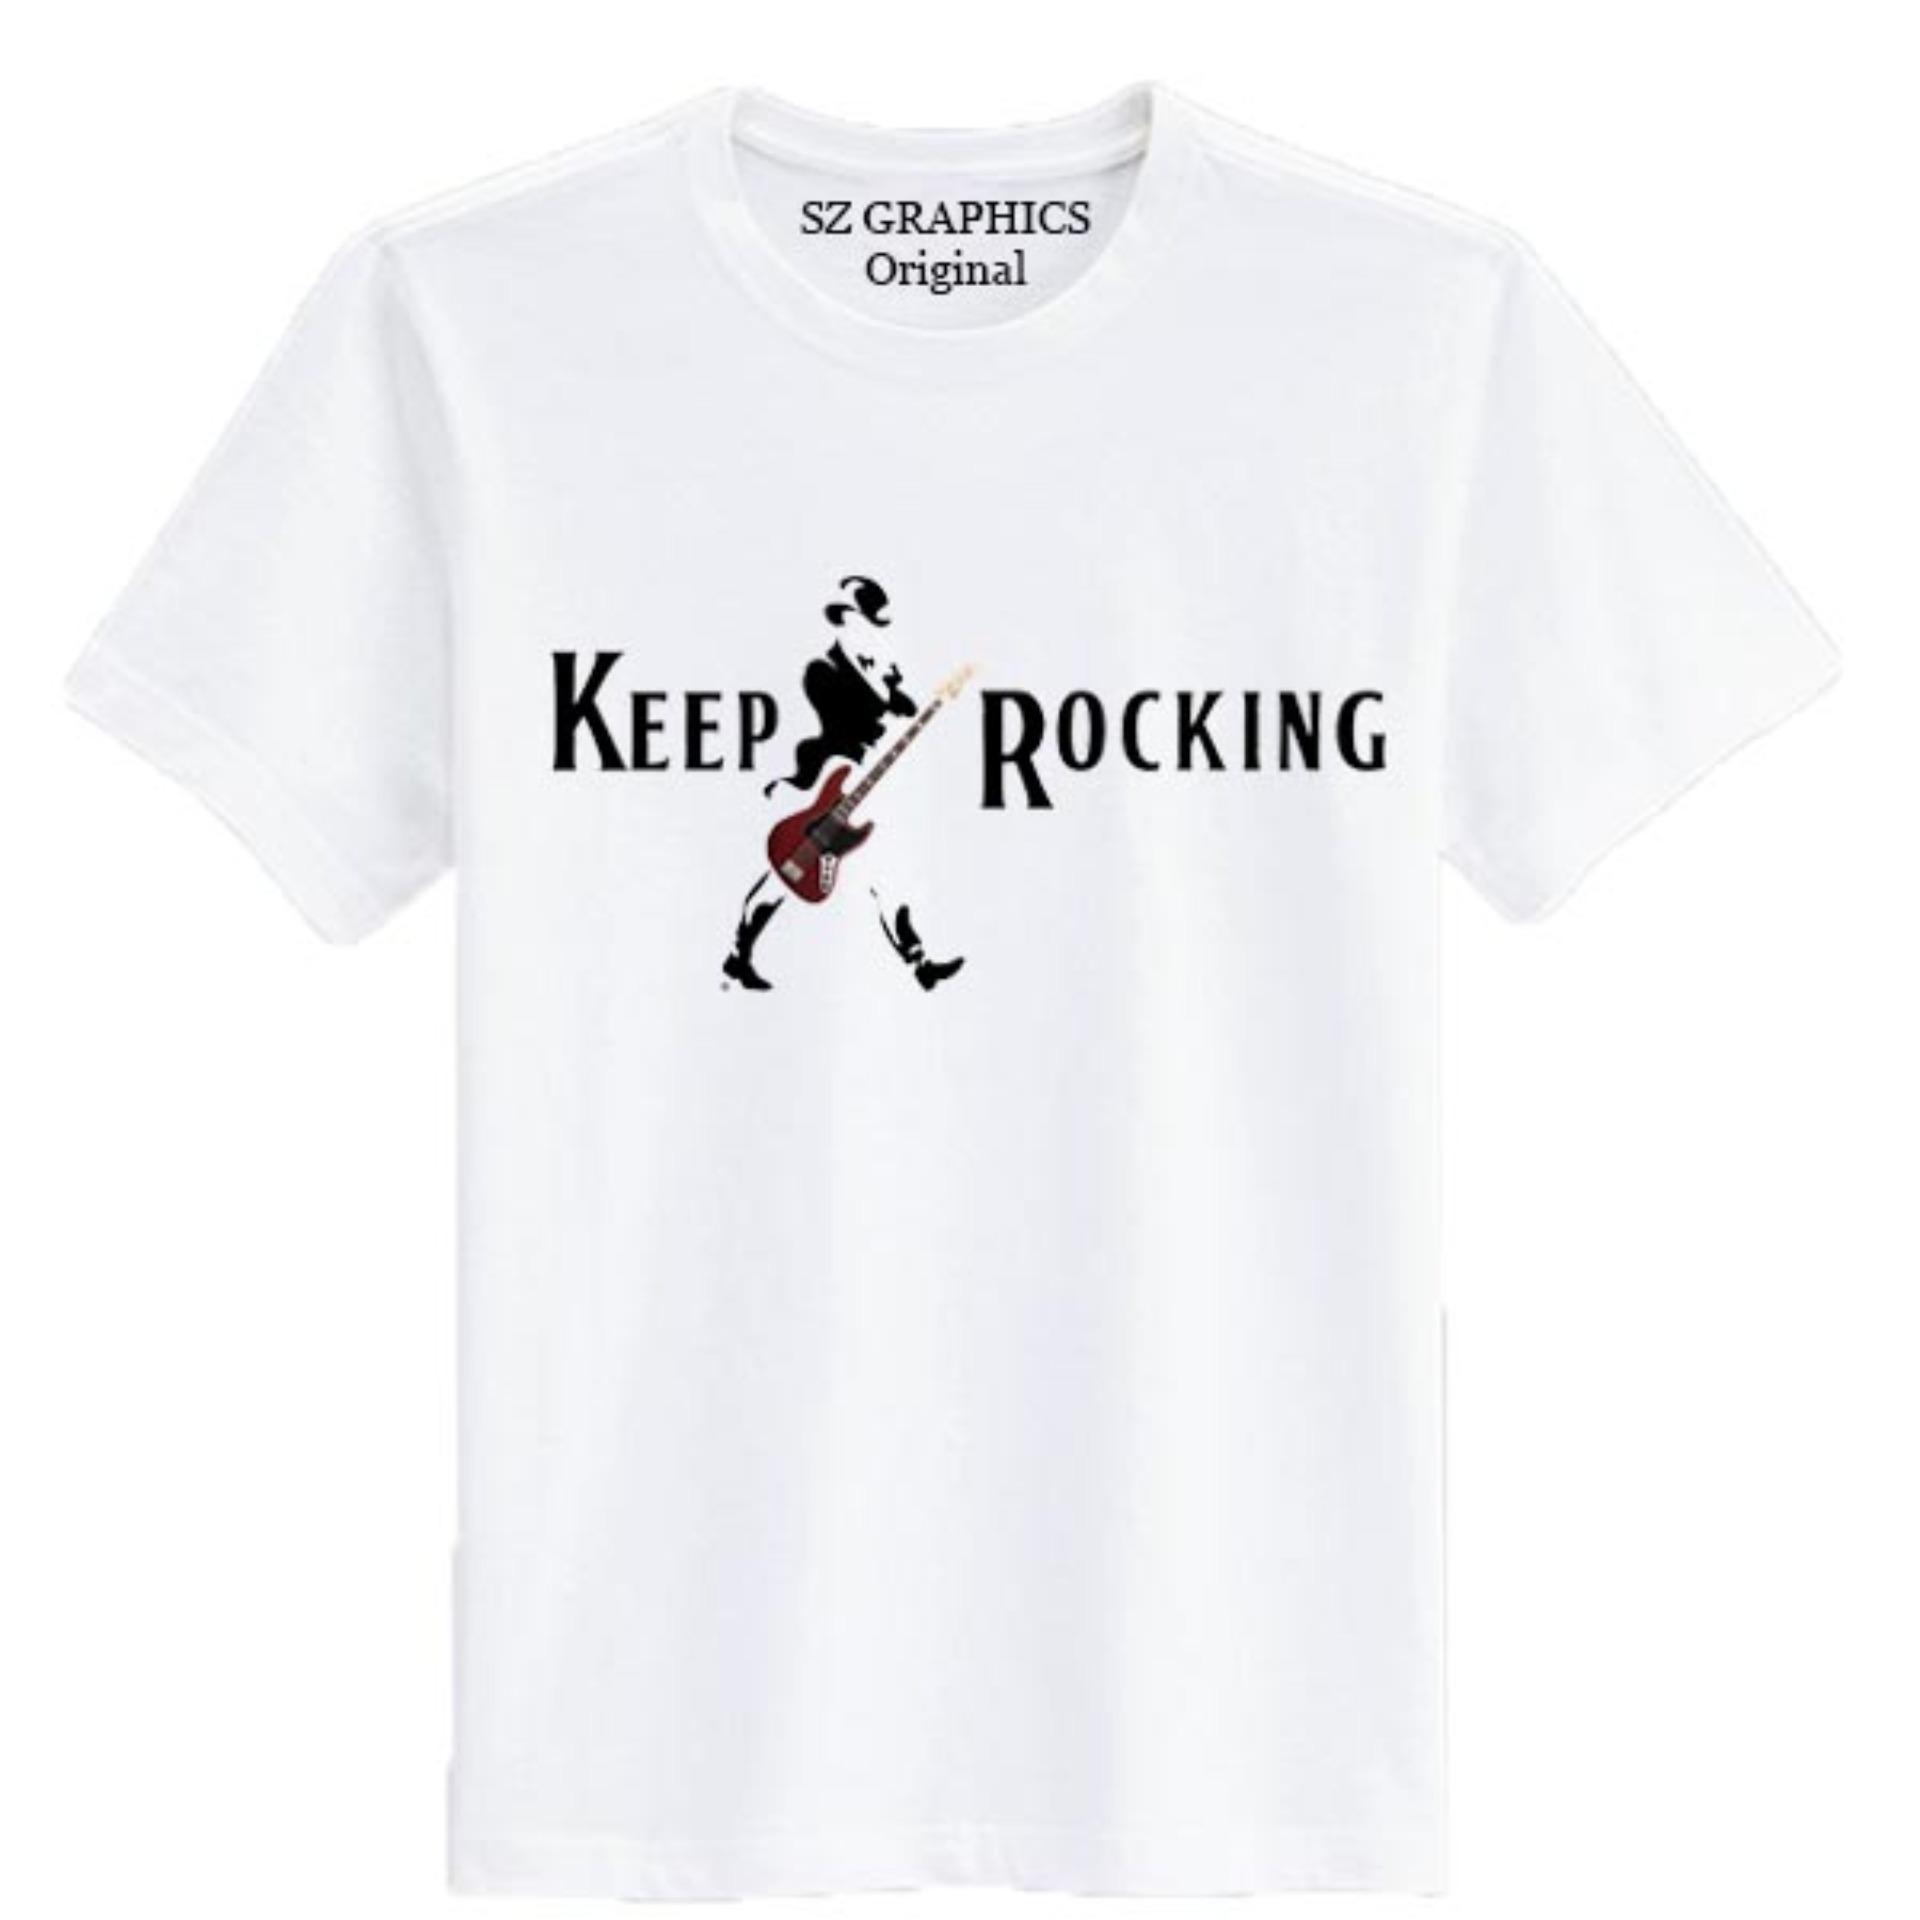 Bandingkan Simpan Sz Graphics Keep Rocking T Shirt Pria Wanita Kaos 4f031e2d70